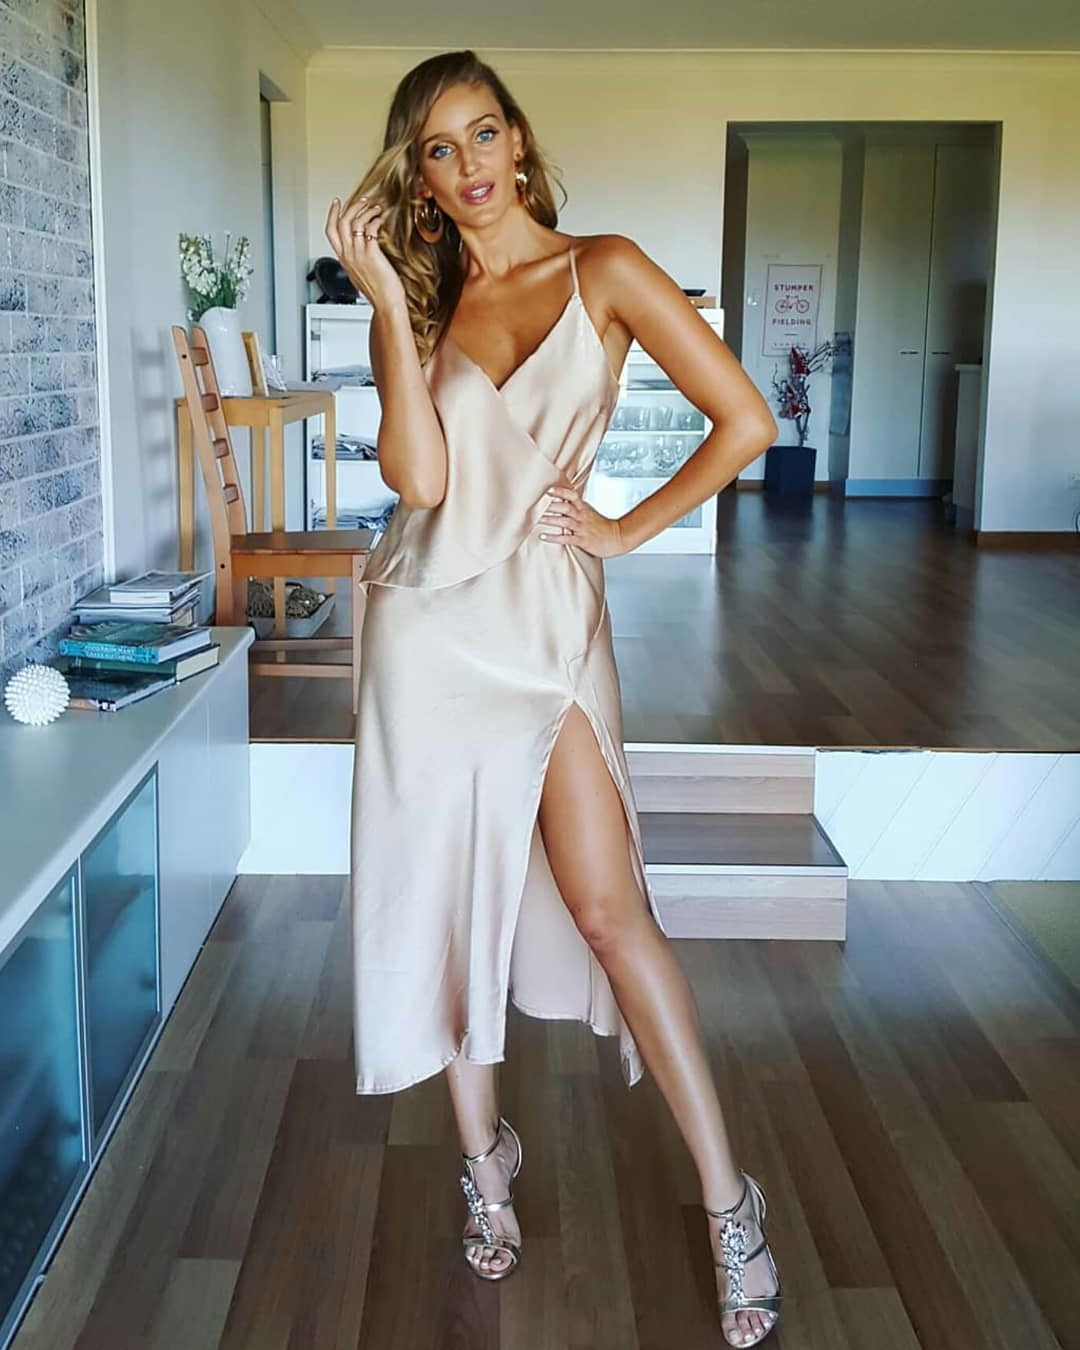 Feet Alyce Crawford nudes (28 foto and video), Tits, Cleavage, Boobs, panties 2019